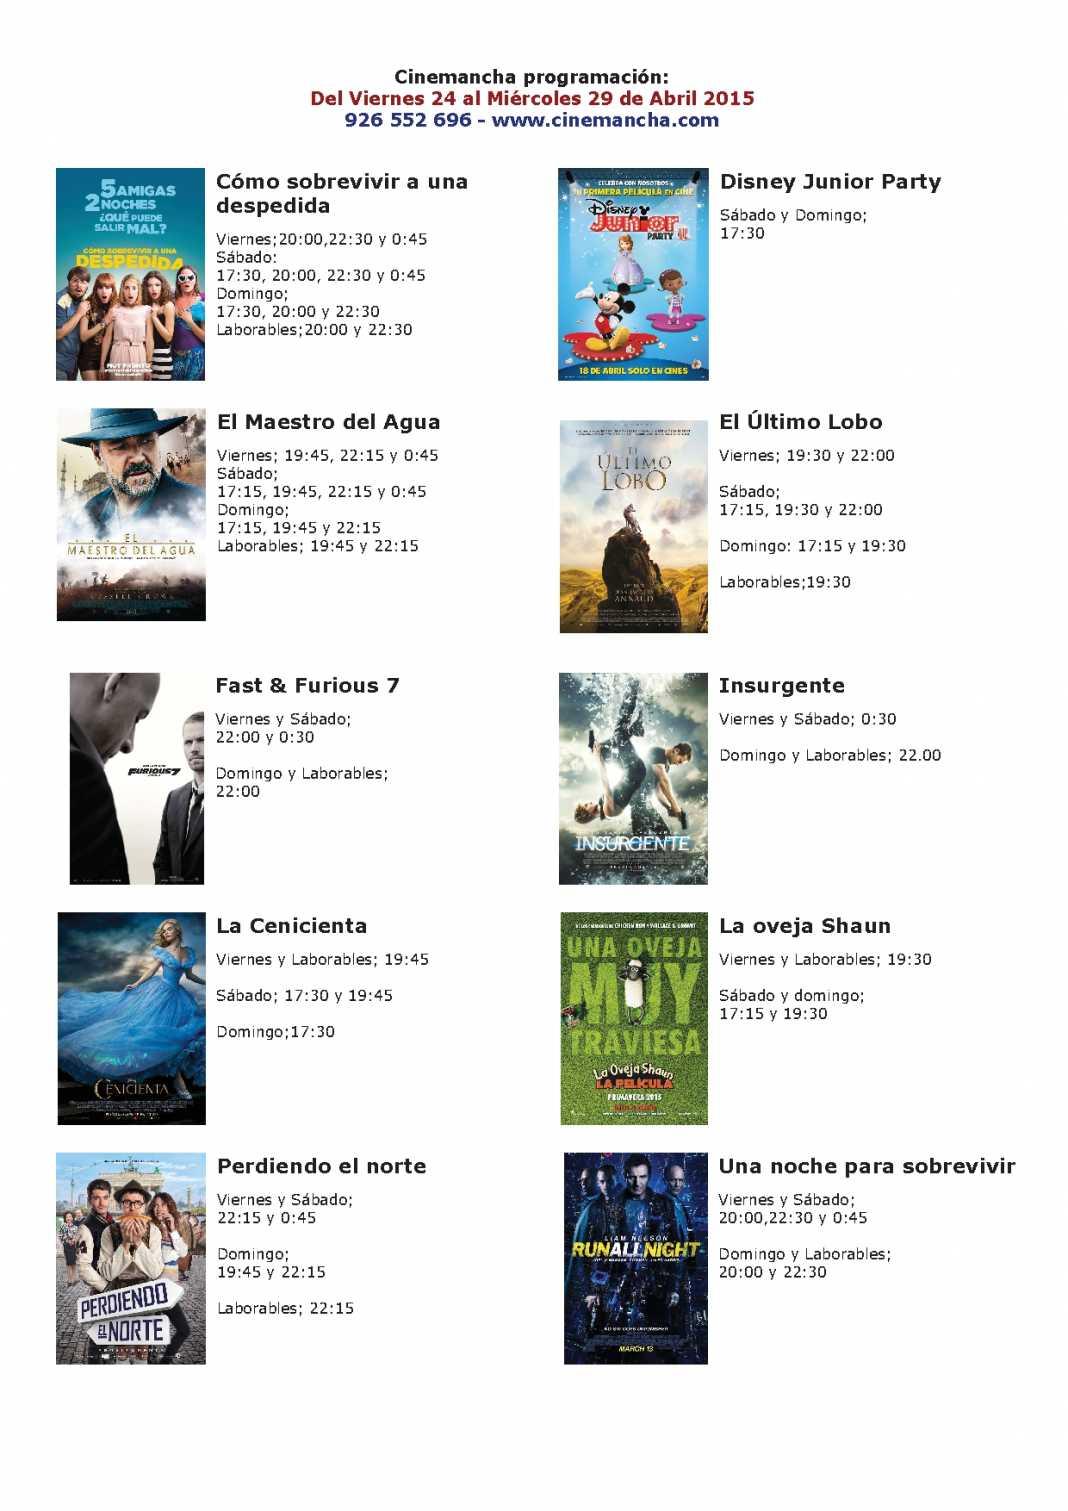 Cartelera de Cinemancha del 24 al 29 de abril 1